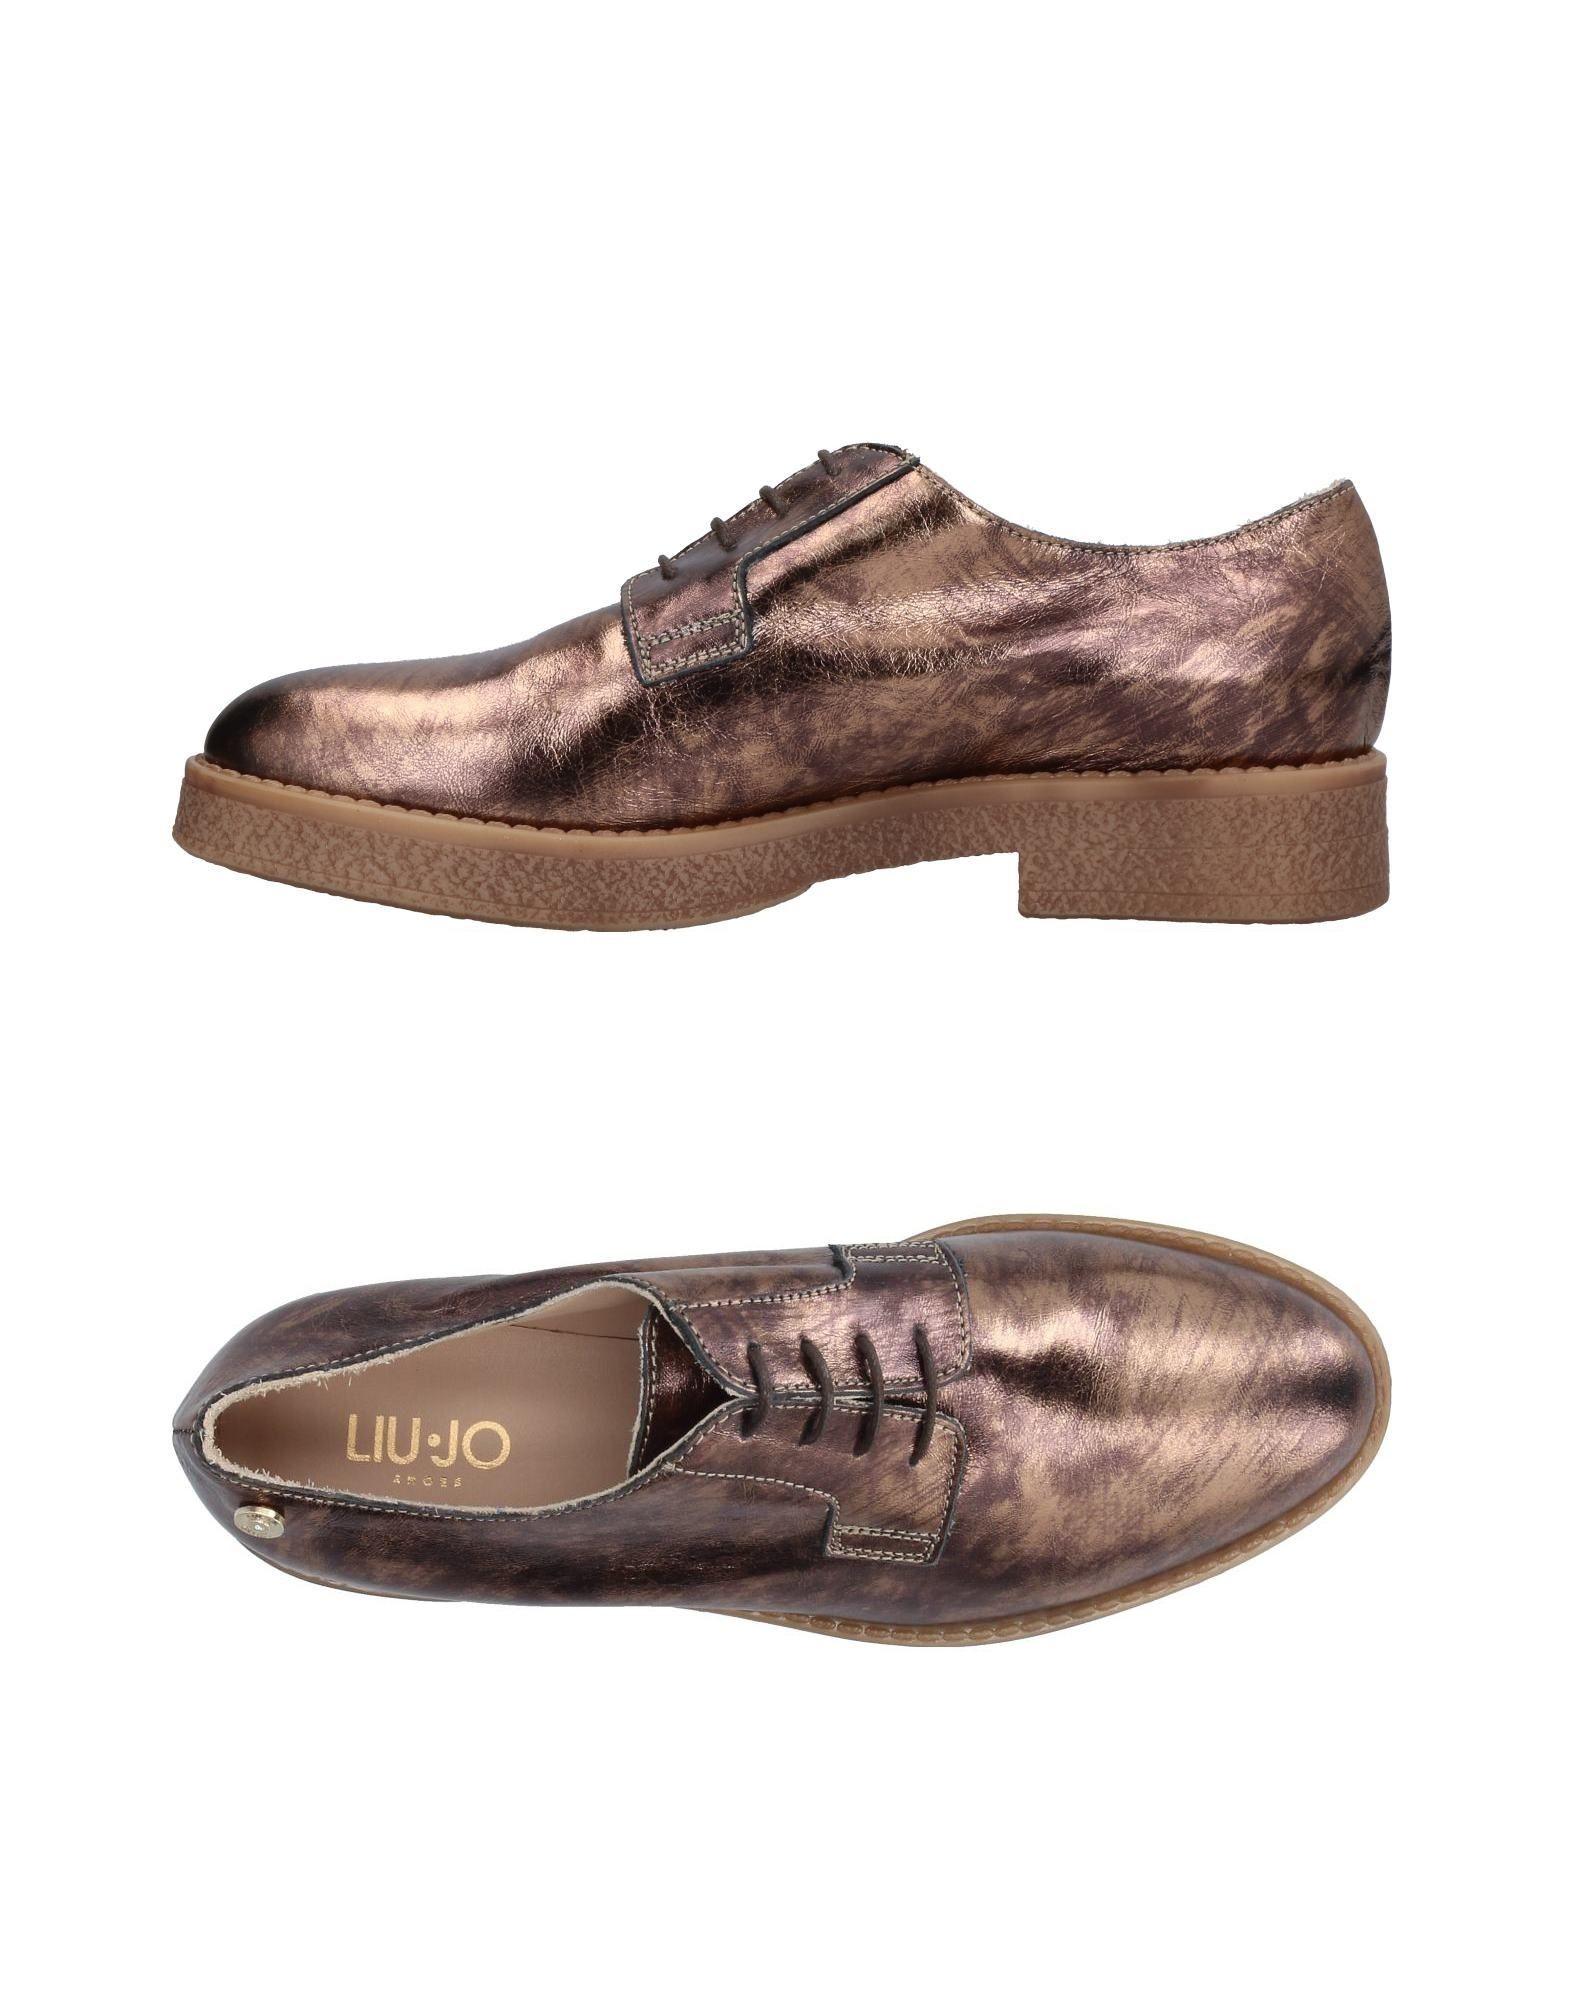 LIU •JO SHOES Обувь на шнурках overall girls denim strap jumpsuit 2017 spring autumn new children cotton suspenders pant high quality jeans overalls